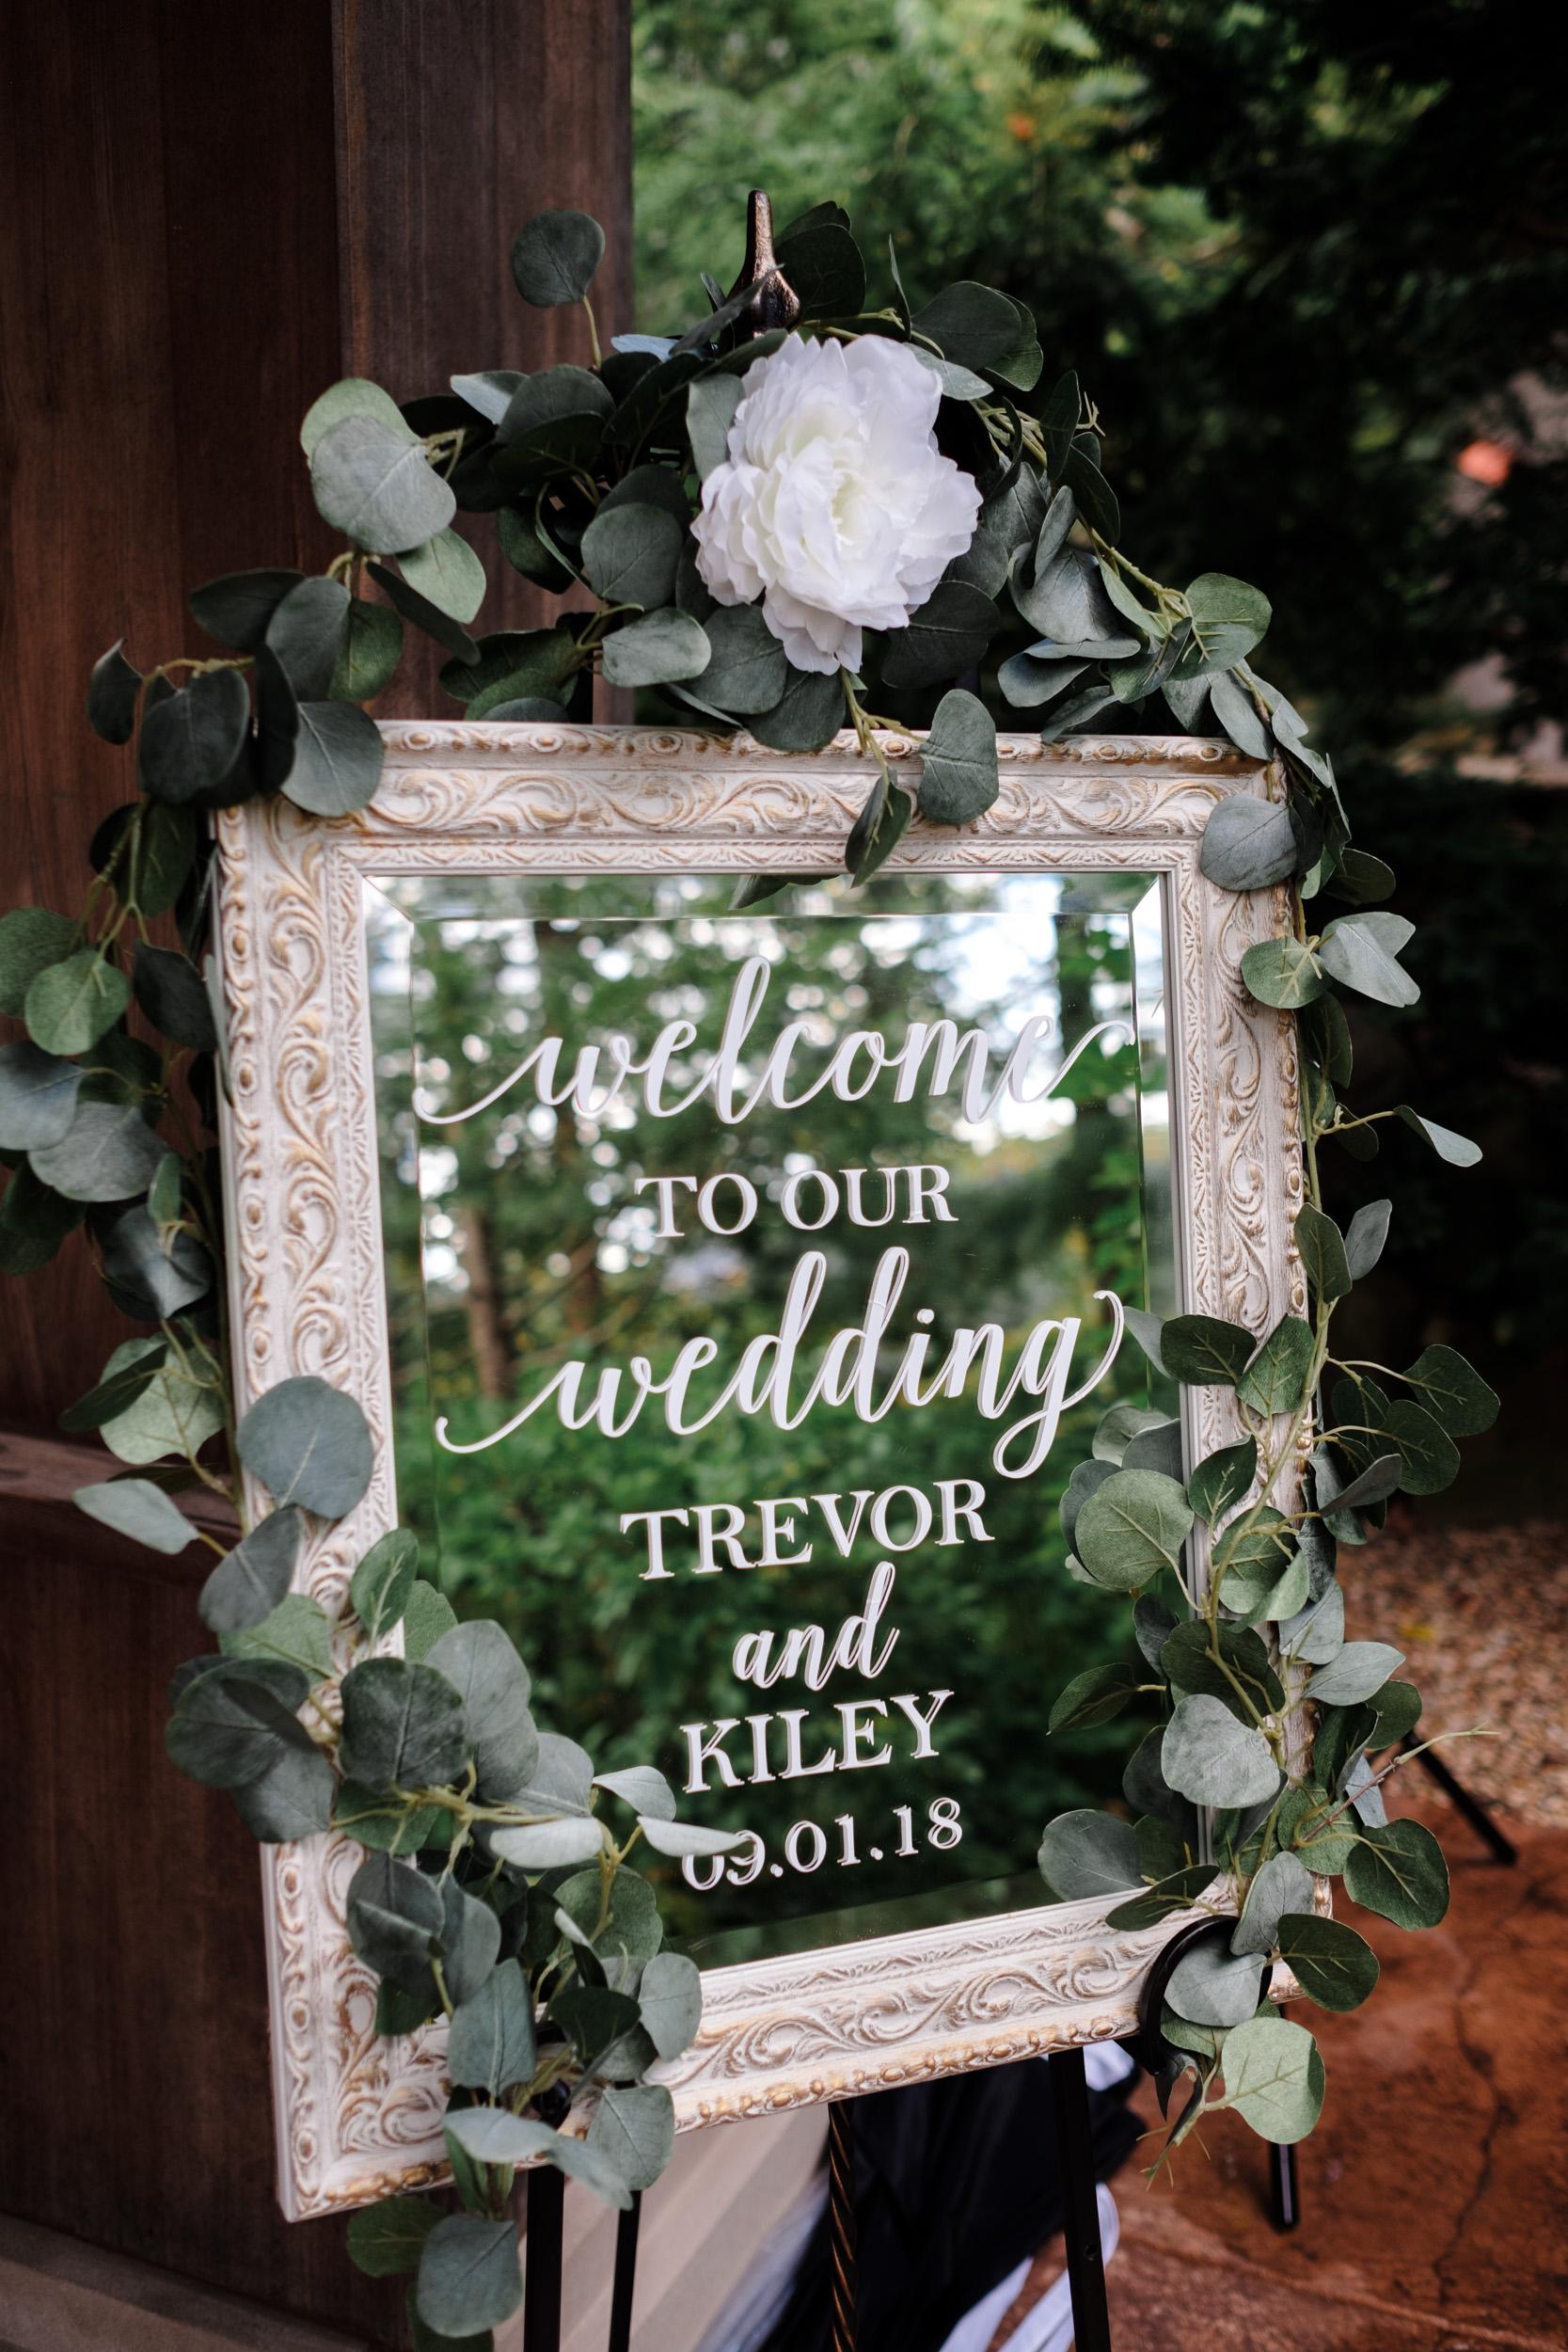 18-09-01 BAP Kiley-Trevor-Anderson-Gardens-Wedding-21.jpg